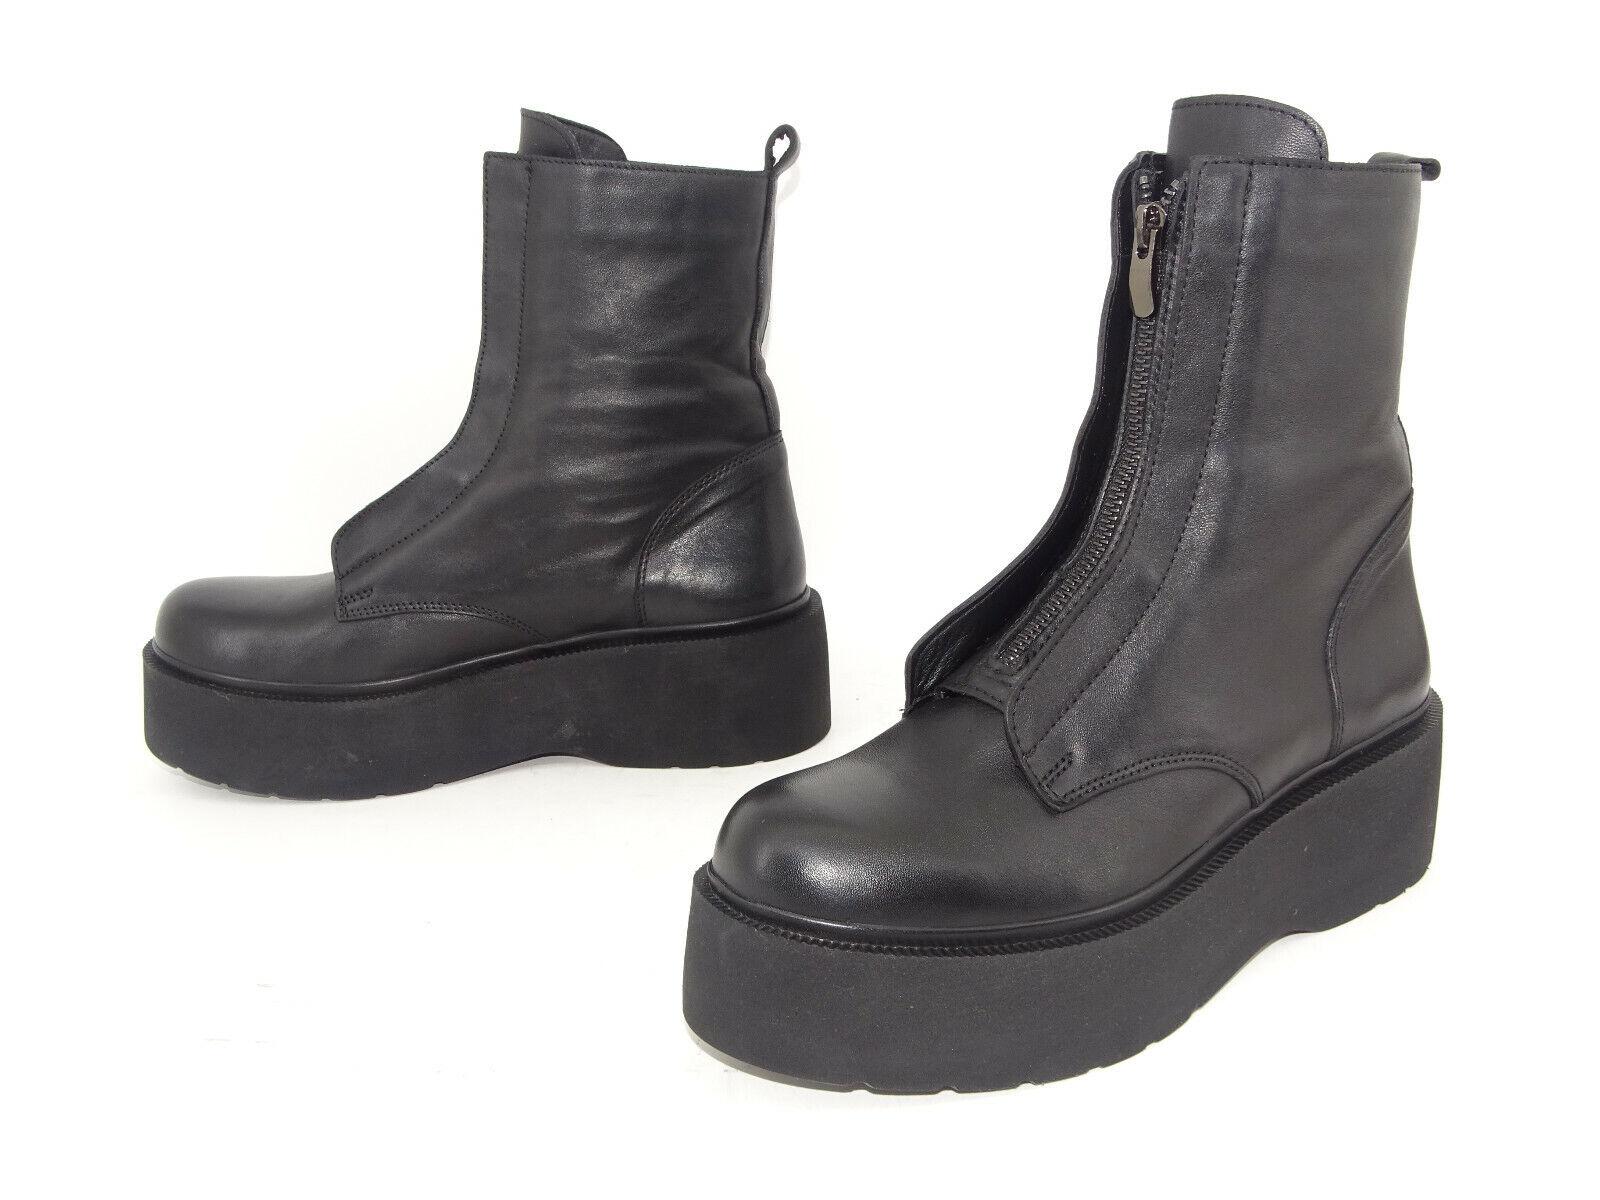 Inuovo Chaussures Bottes Bottines Plateforme Bottes Bottes Femmes Neuf Taille 40